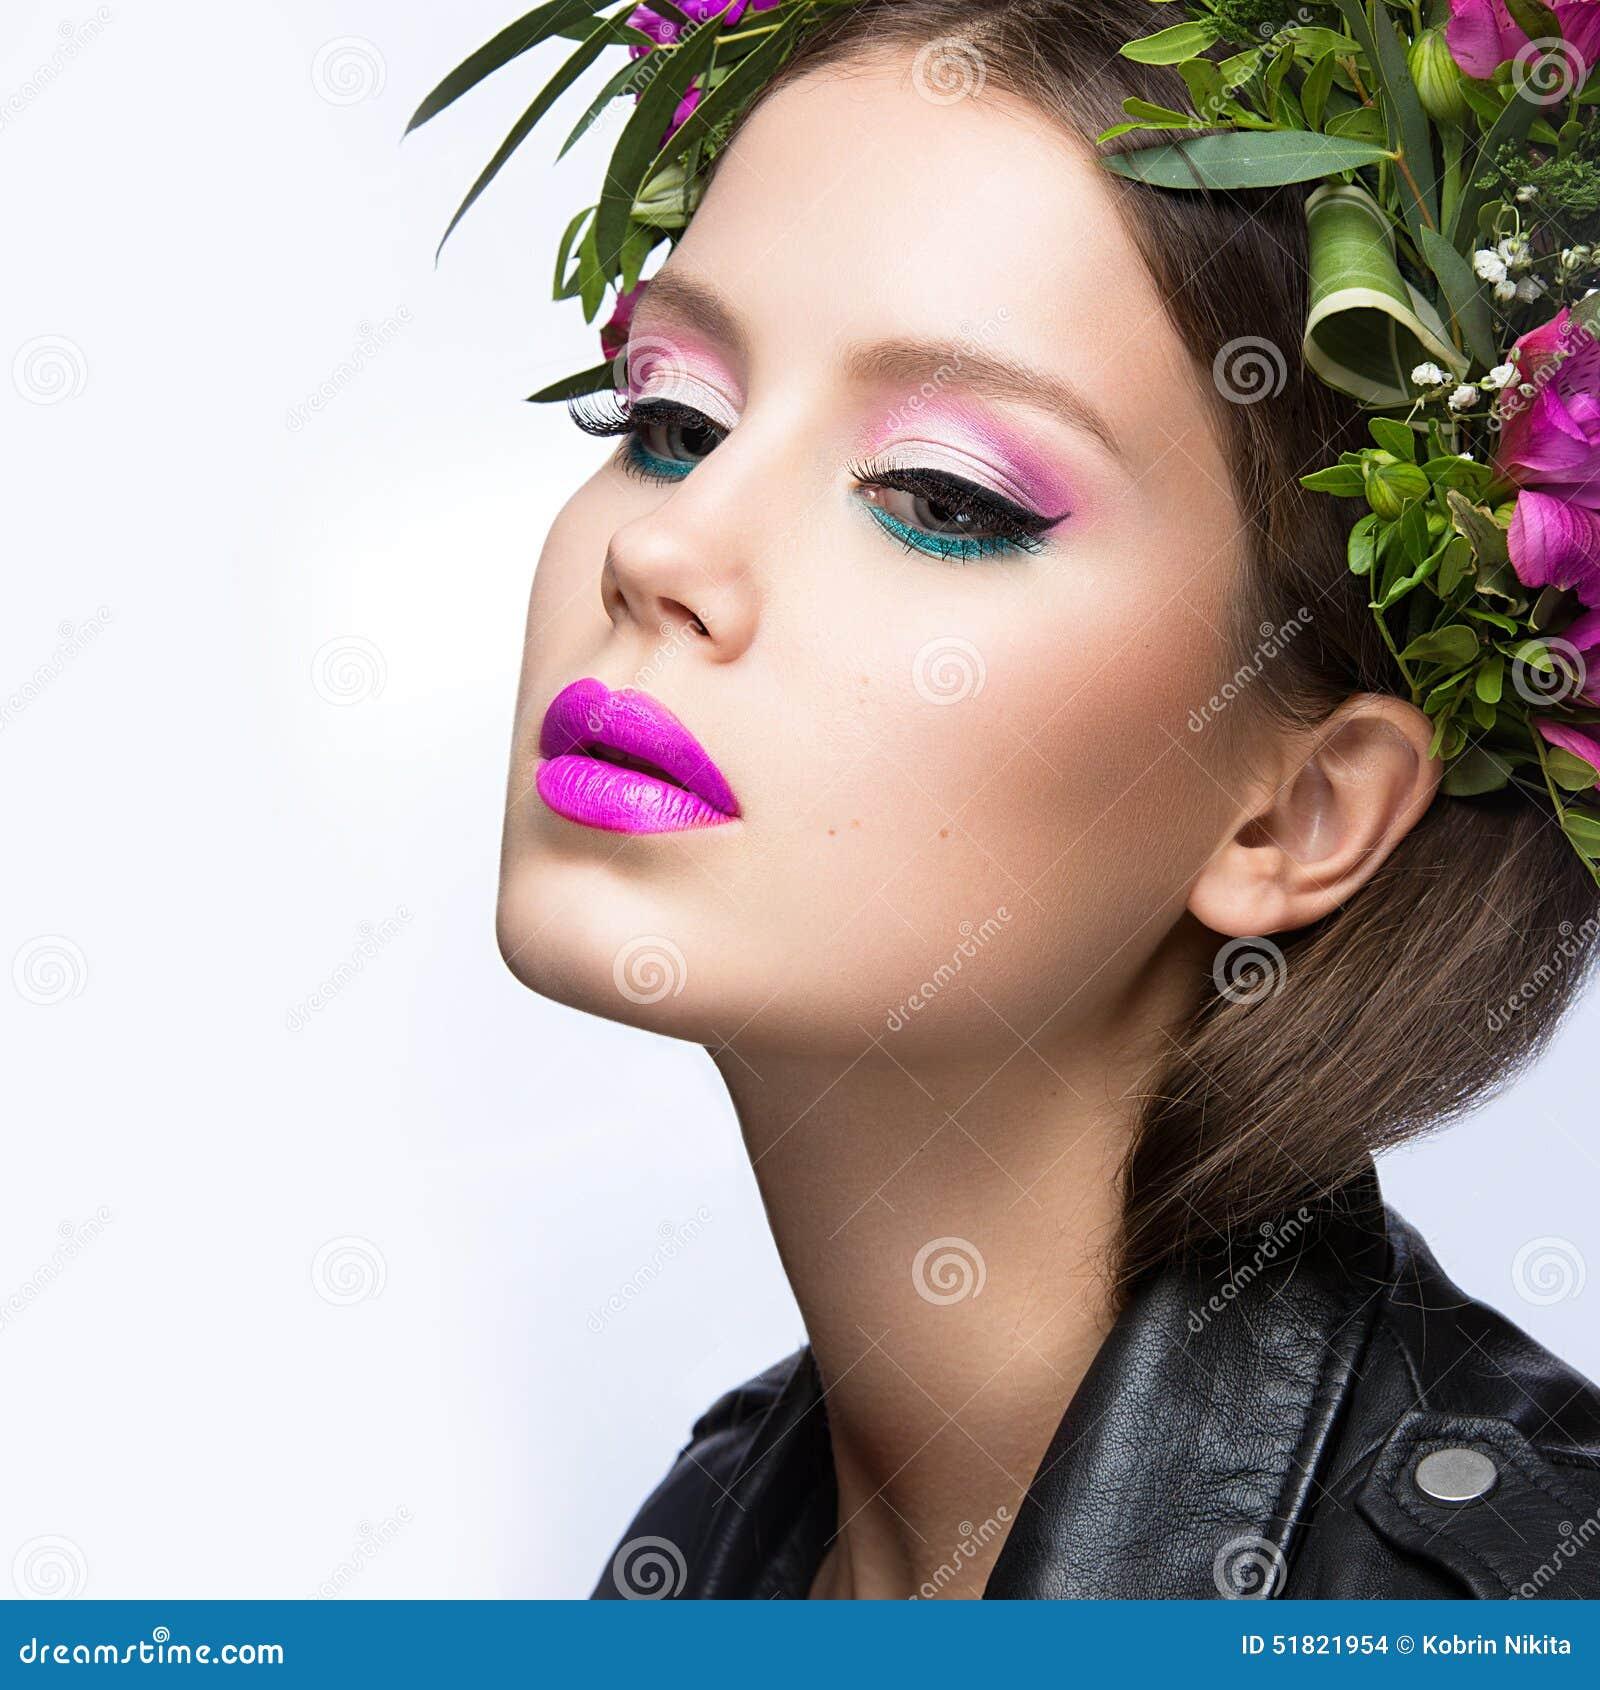 beauty girl face make - photo #22